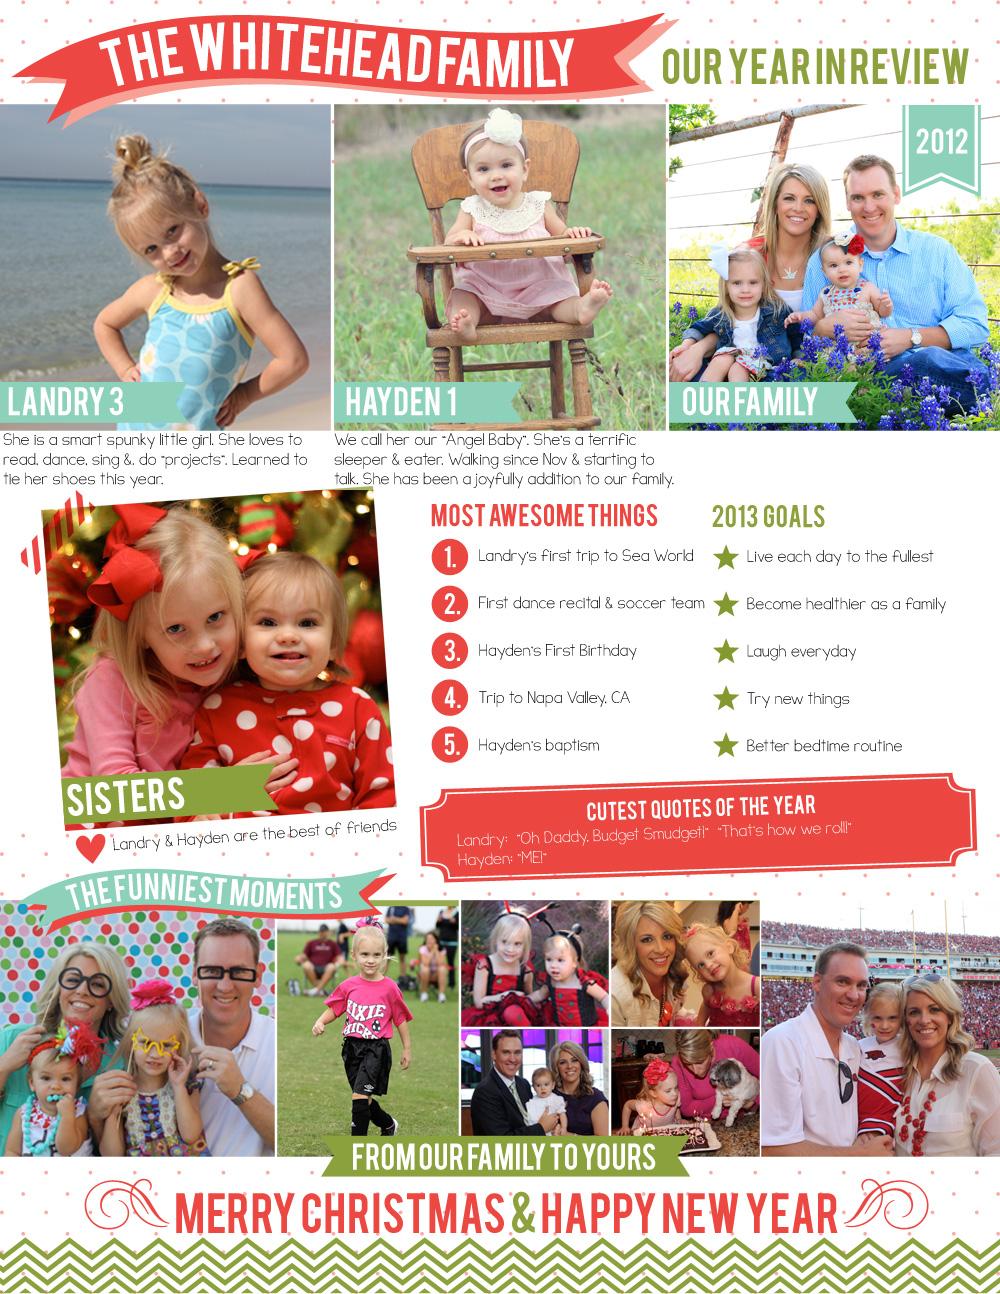 Whitehead's Wonder Years: Family Newsletter